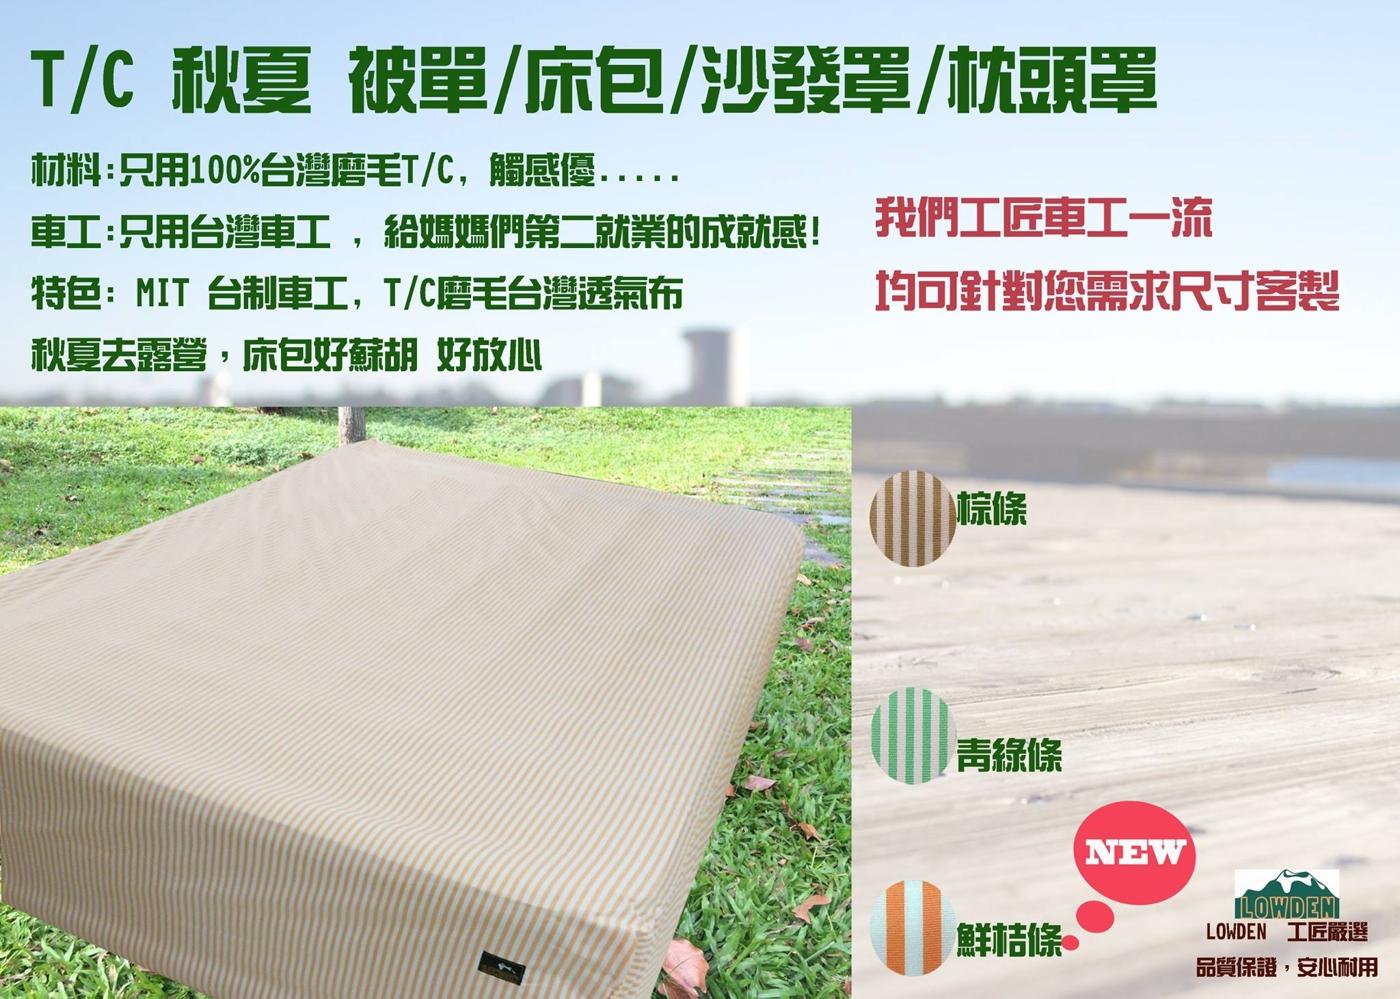 LOWDEN客製化床包夏日涼爽款-NTB13努特NUIT夢遊仙境充氣床墊XL露營床睡墊床包免運優惠中